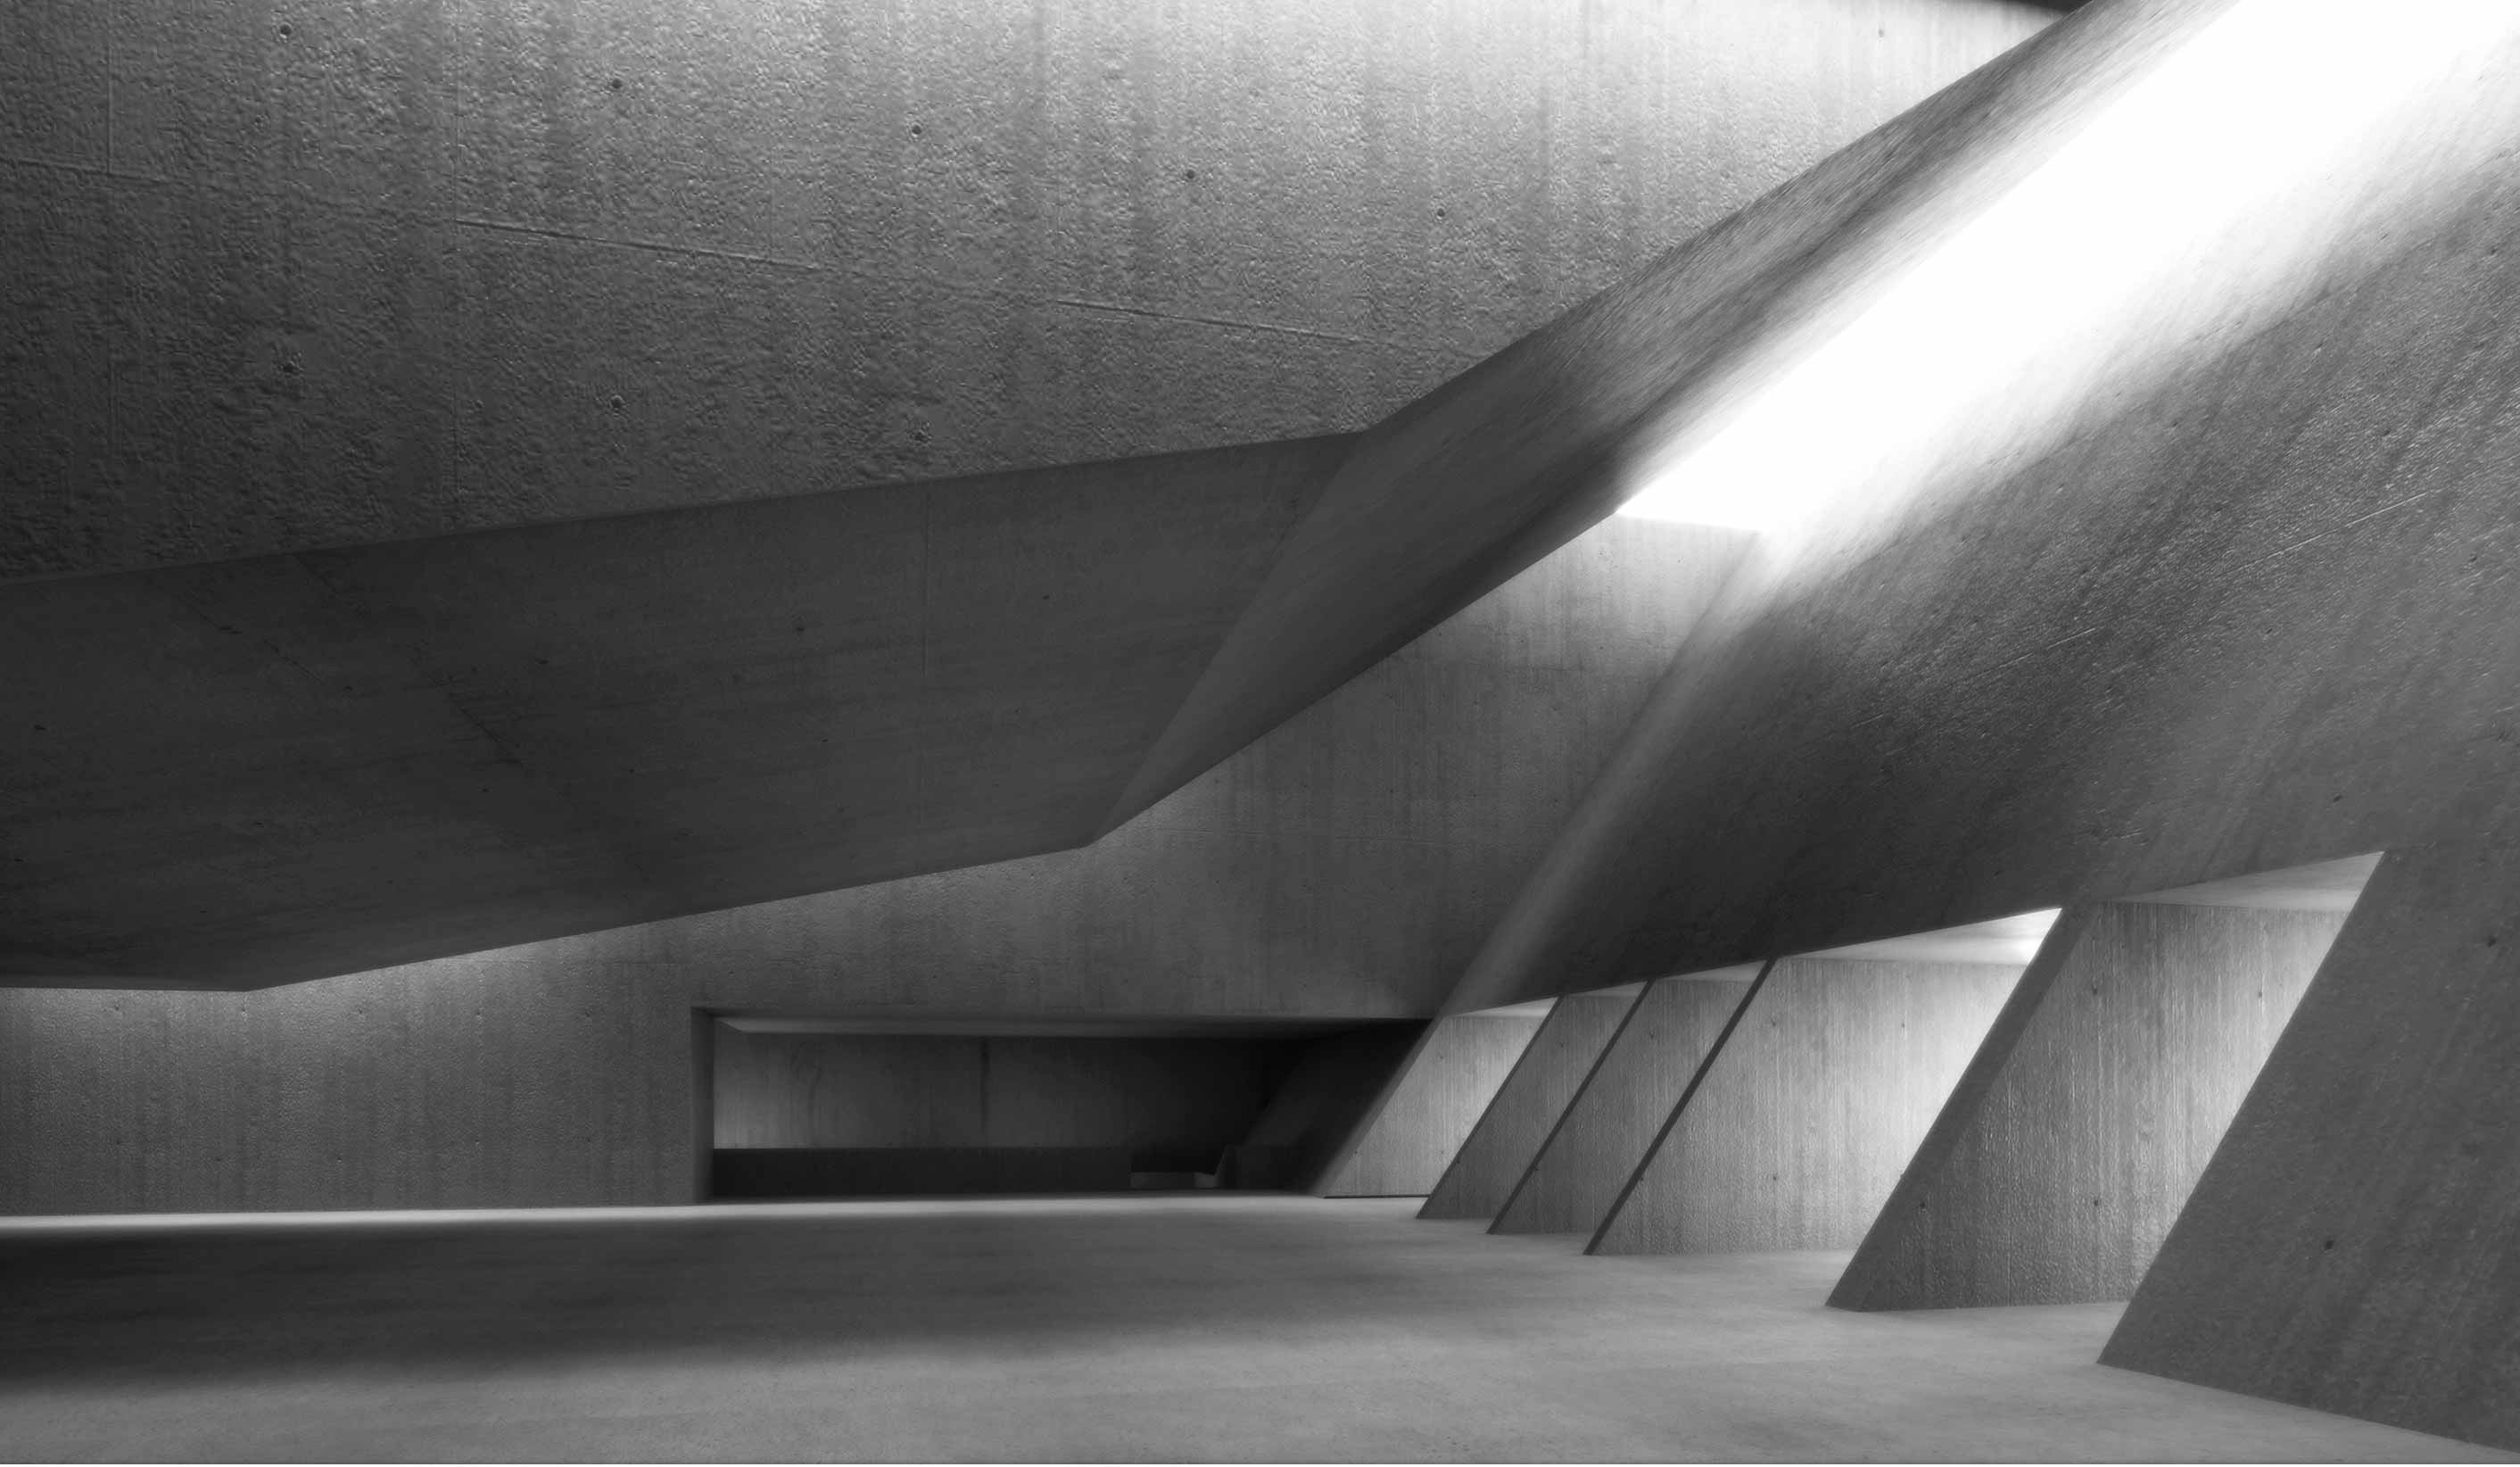 Interview with the architect: Arta Rostami Ravari